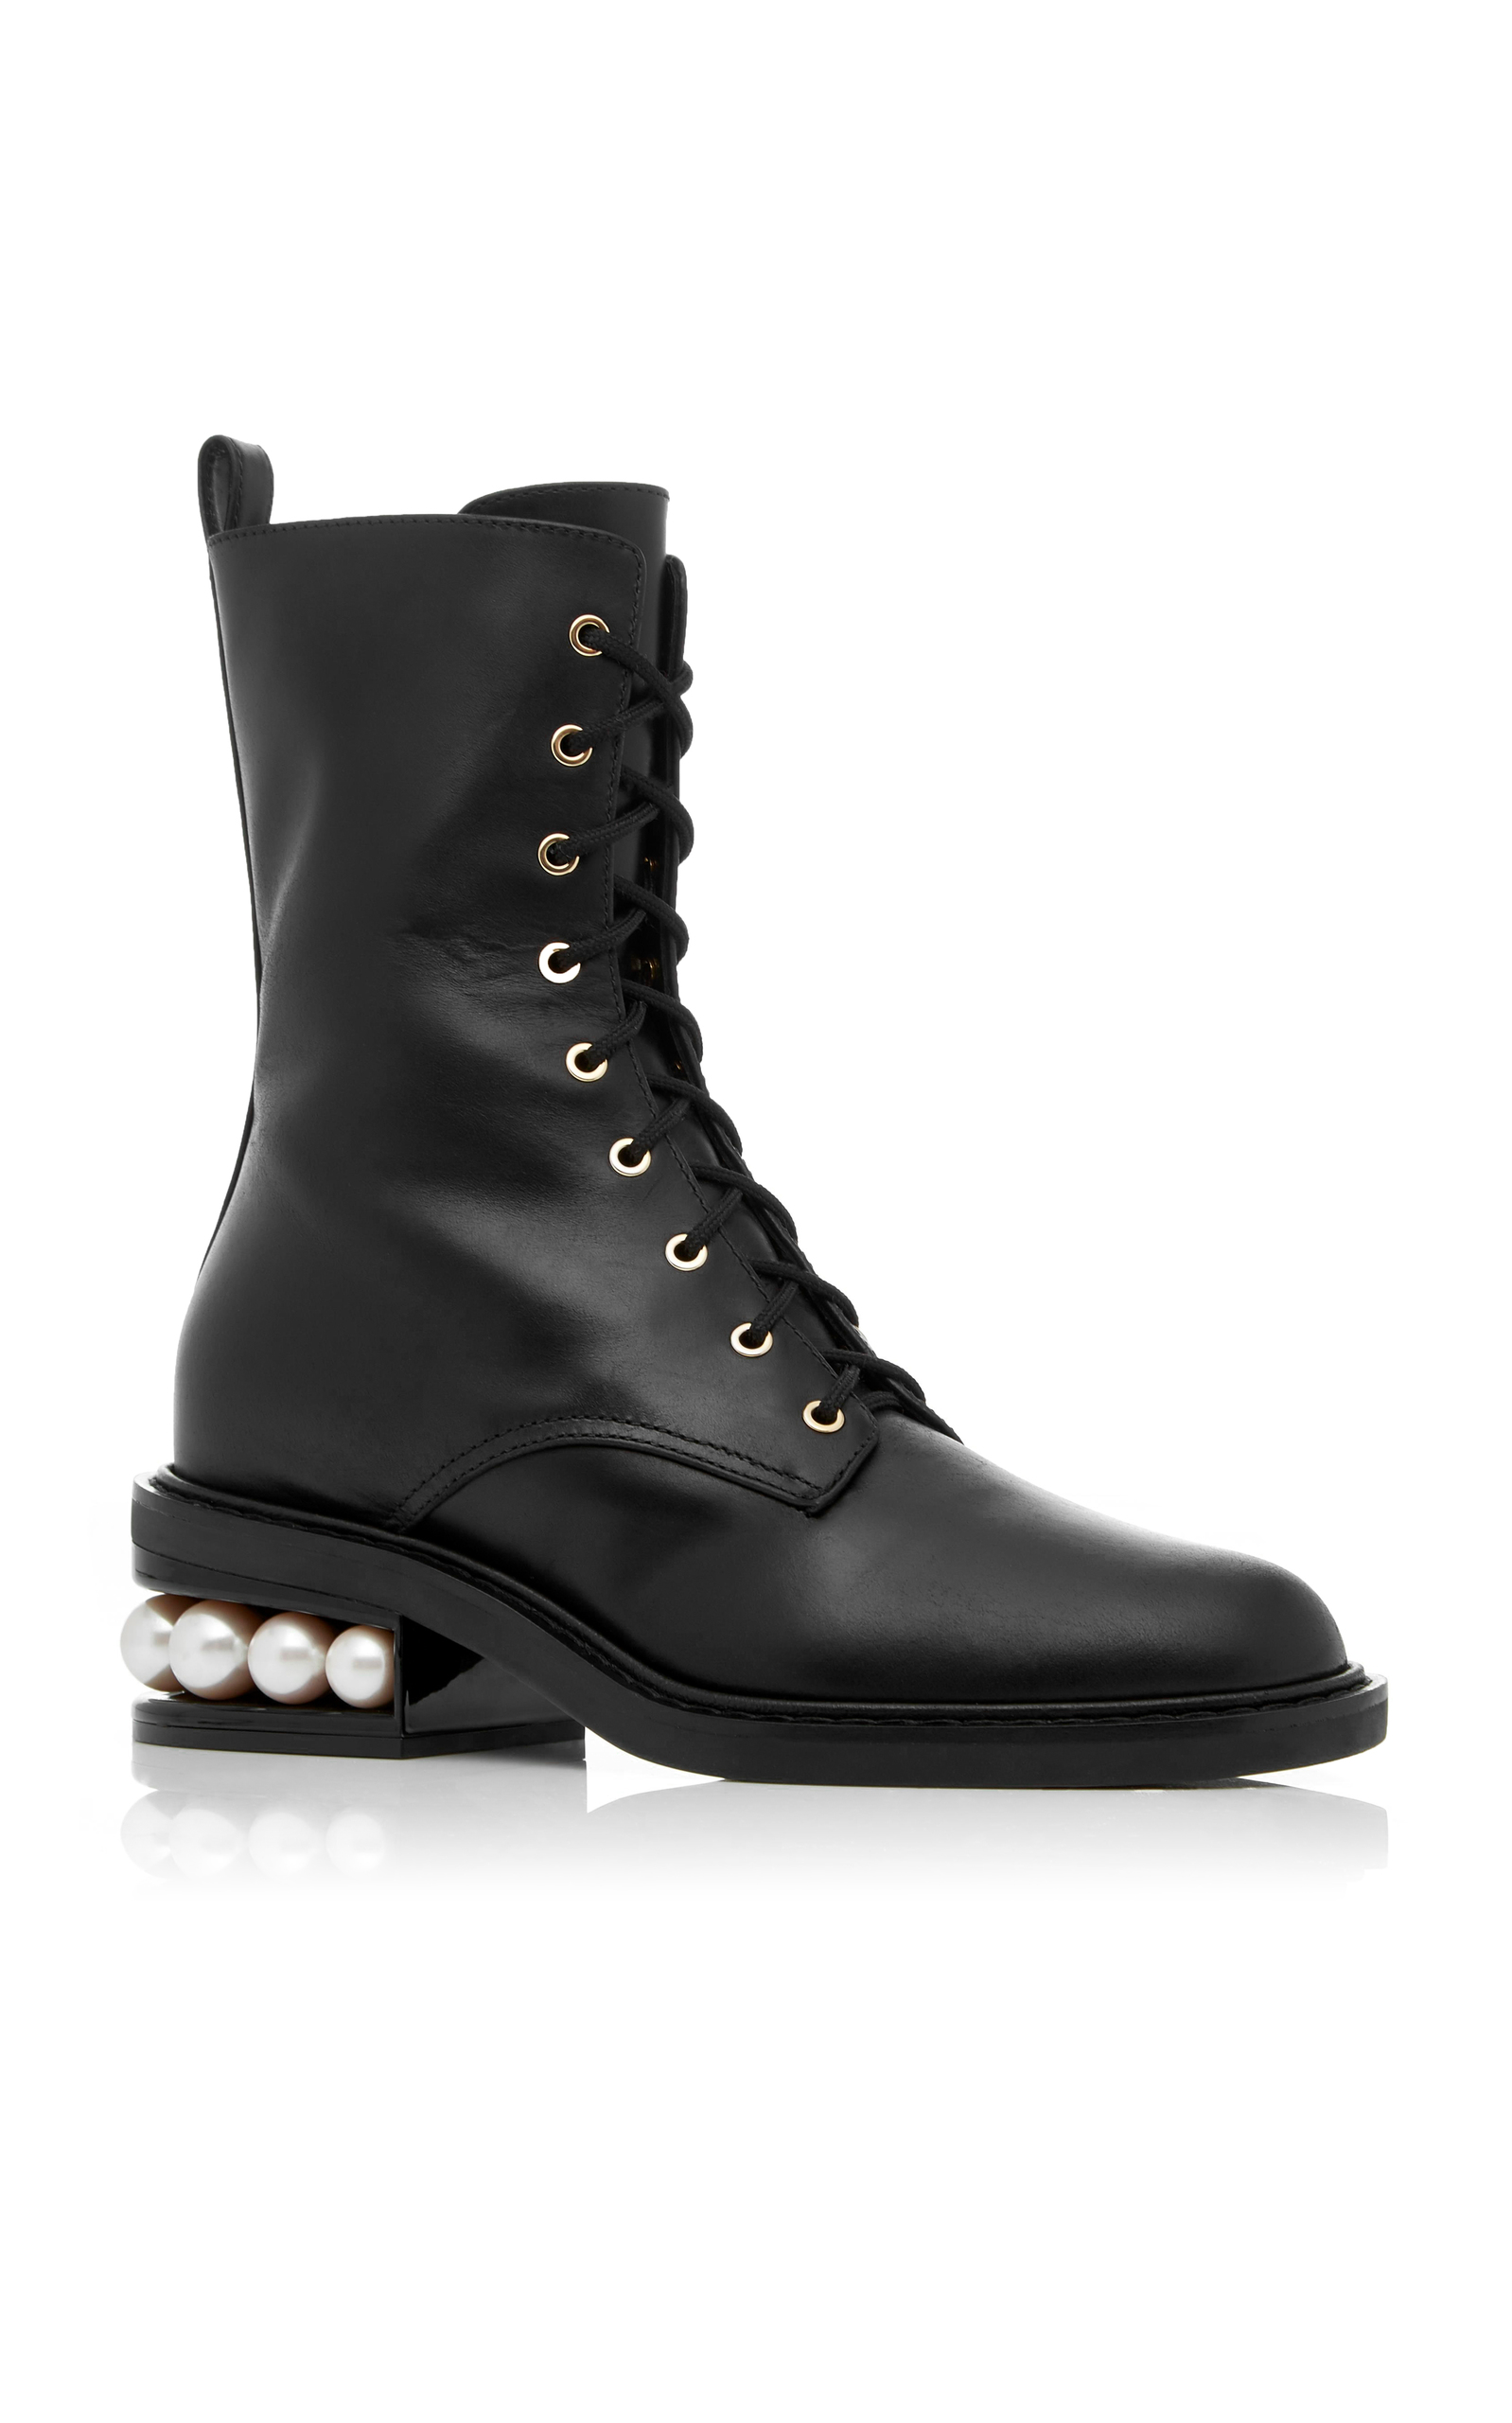 Nicholas Kirkwood Casati Pearl Leather Combat Boots RySVNYSVN9